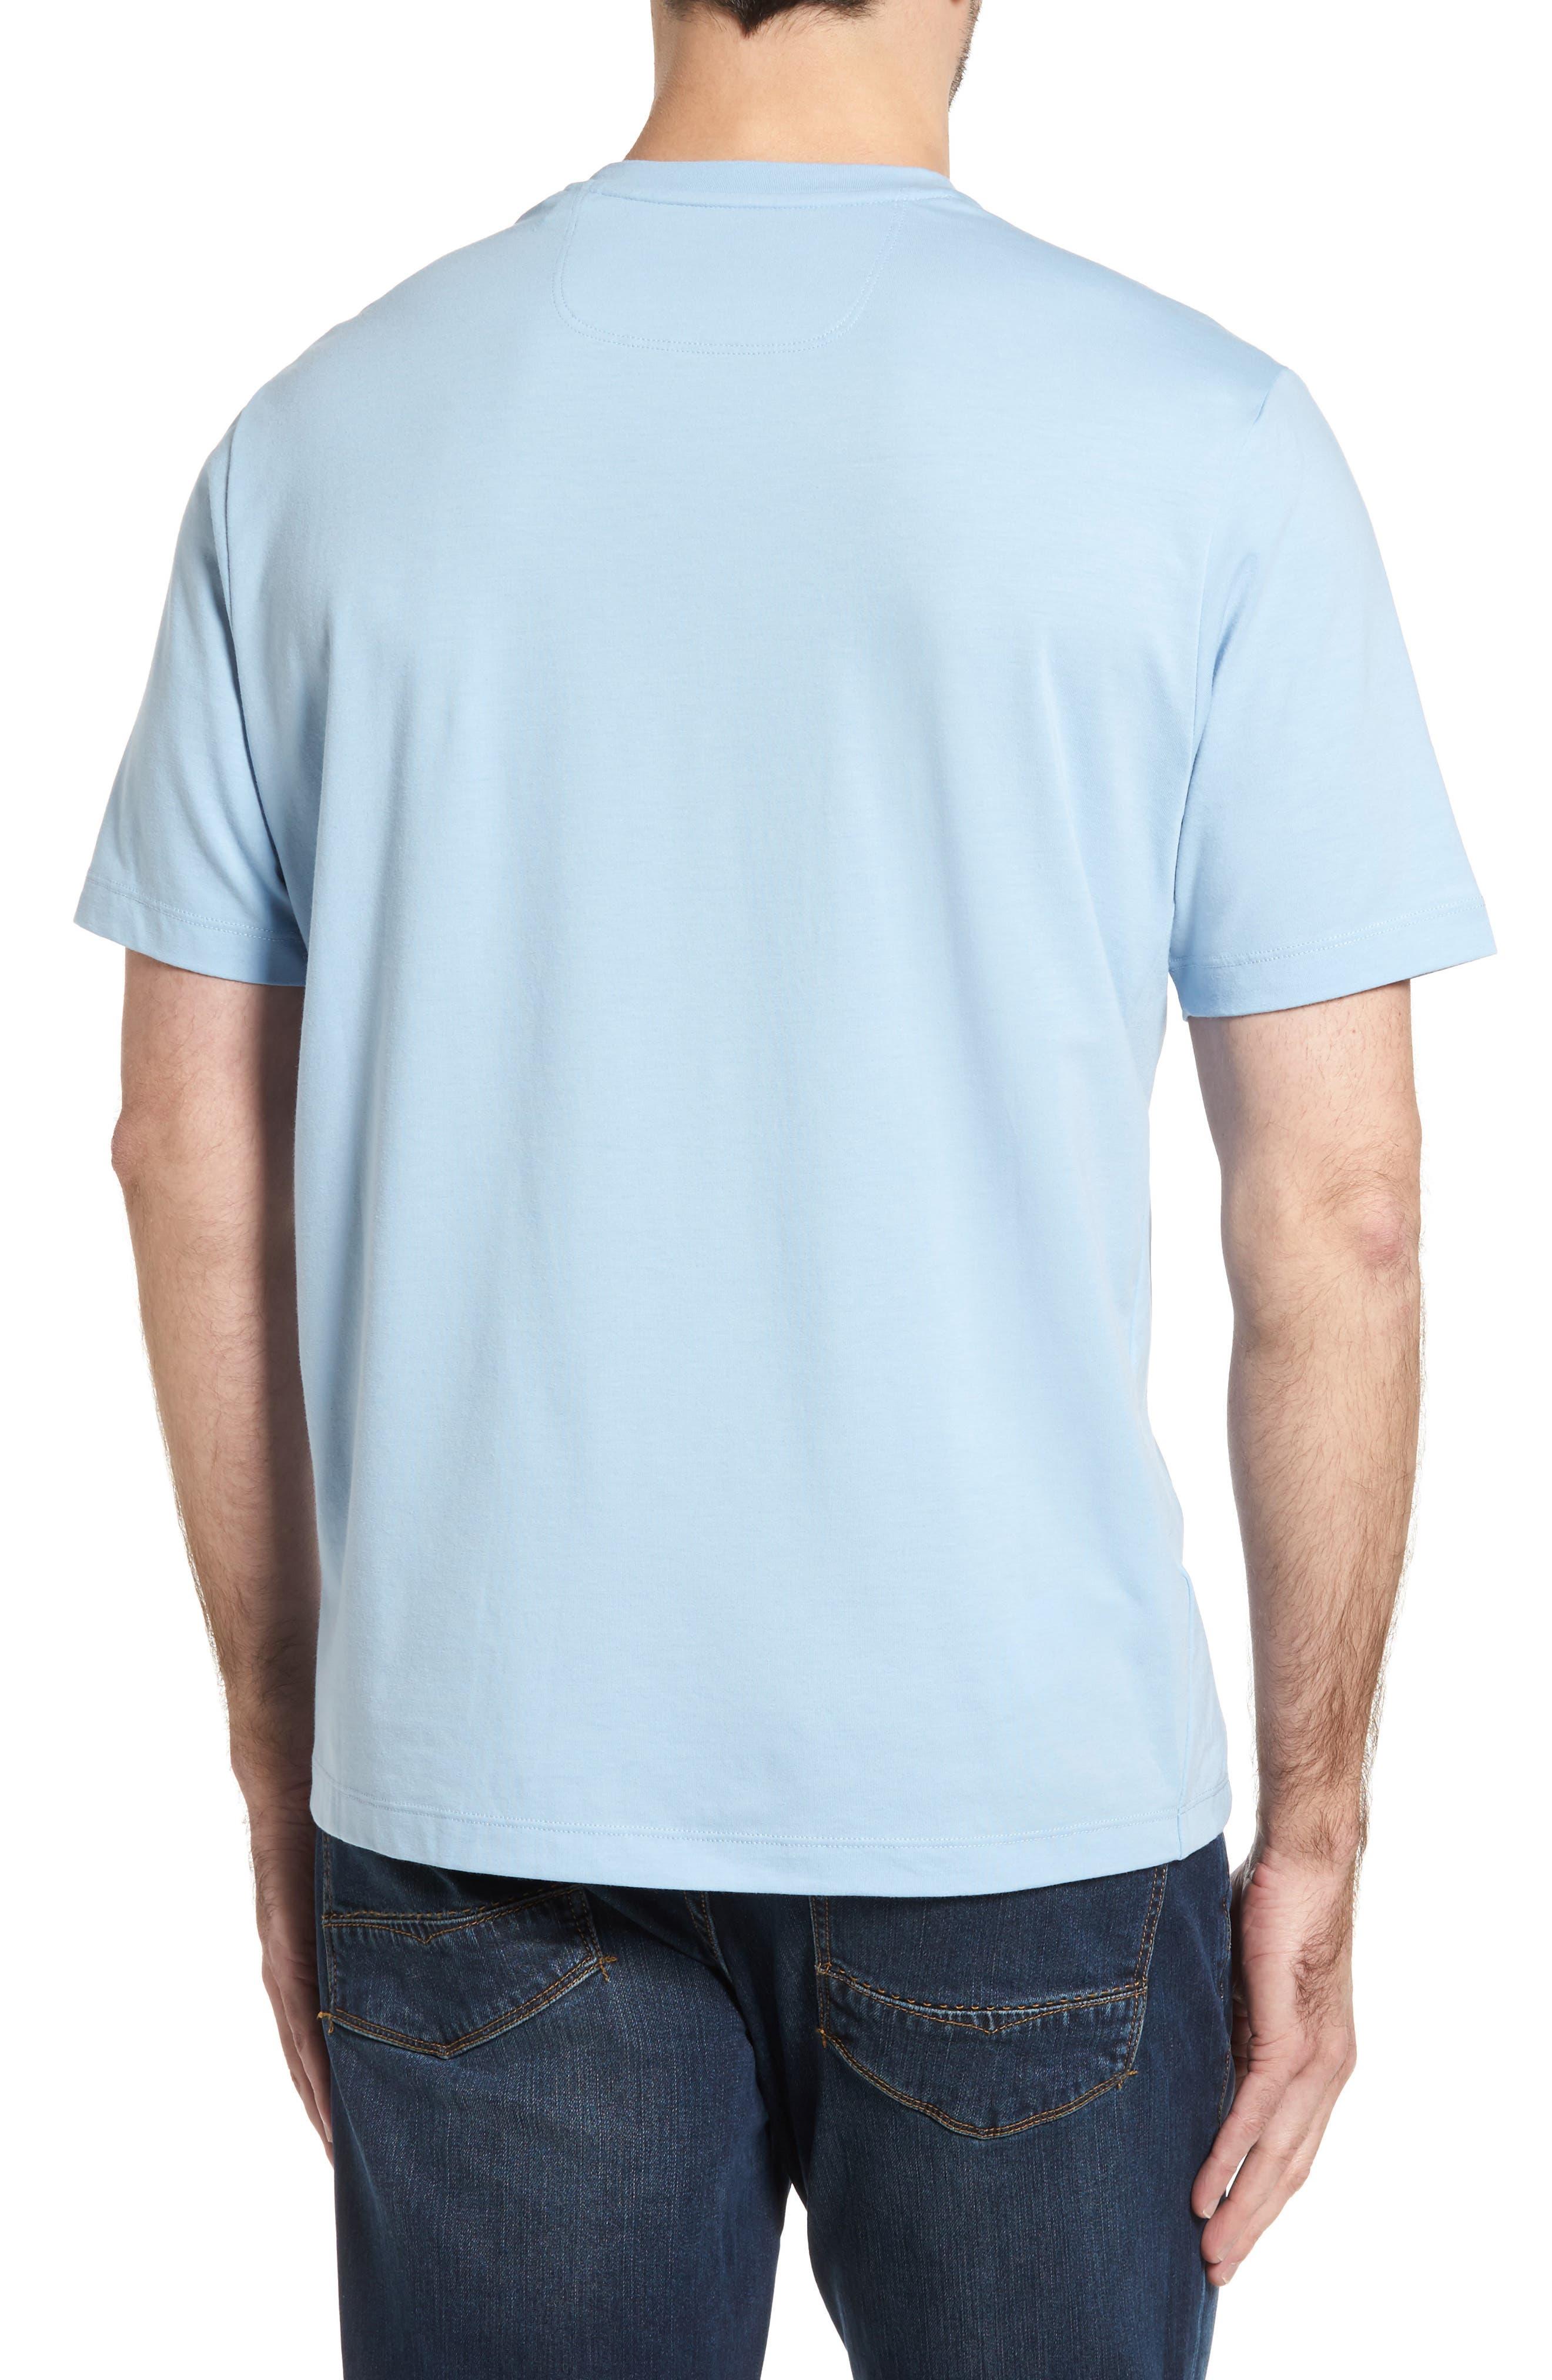 Tropicool T-Shirt,                             Alternate thumbnail 18, color,